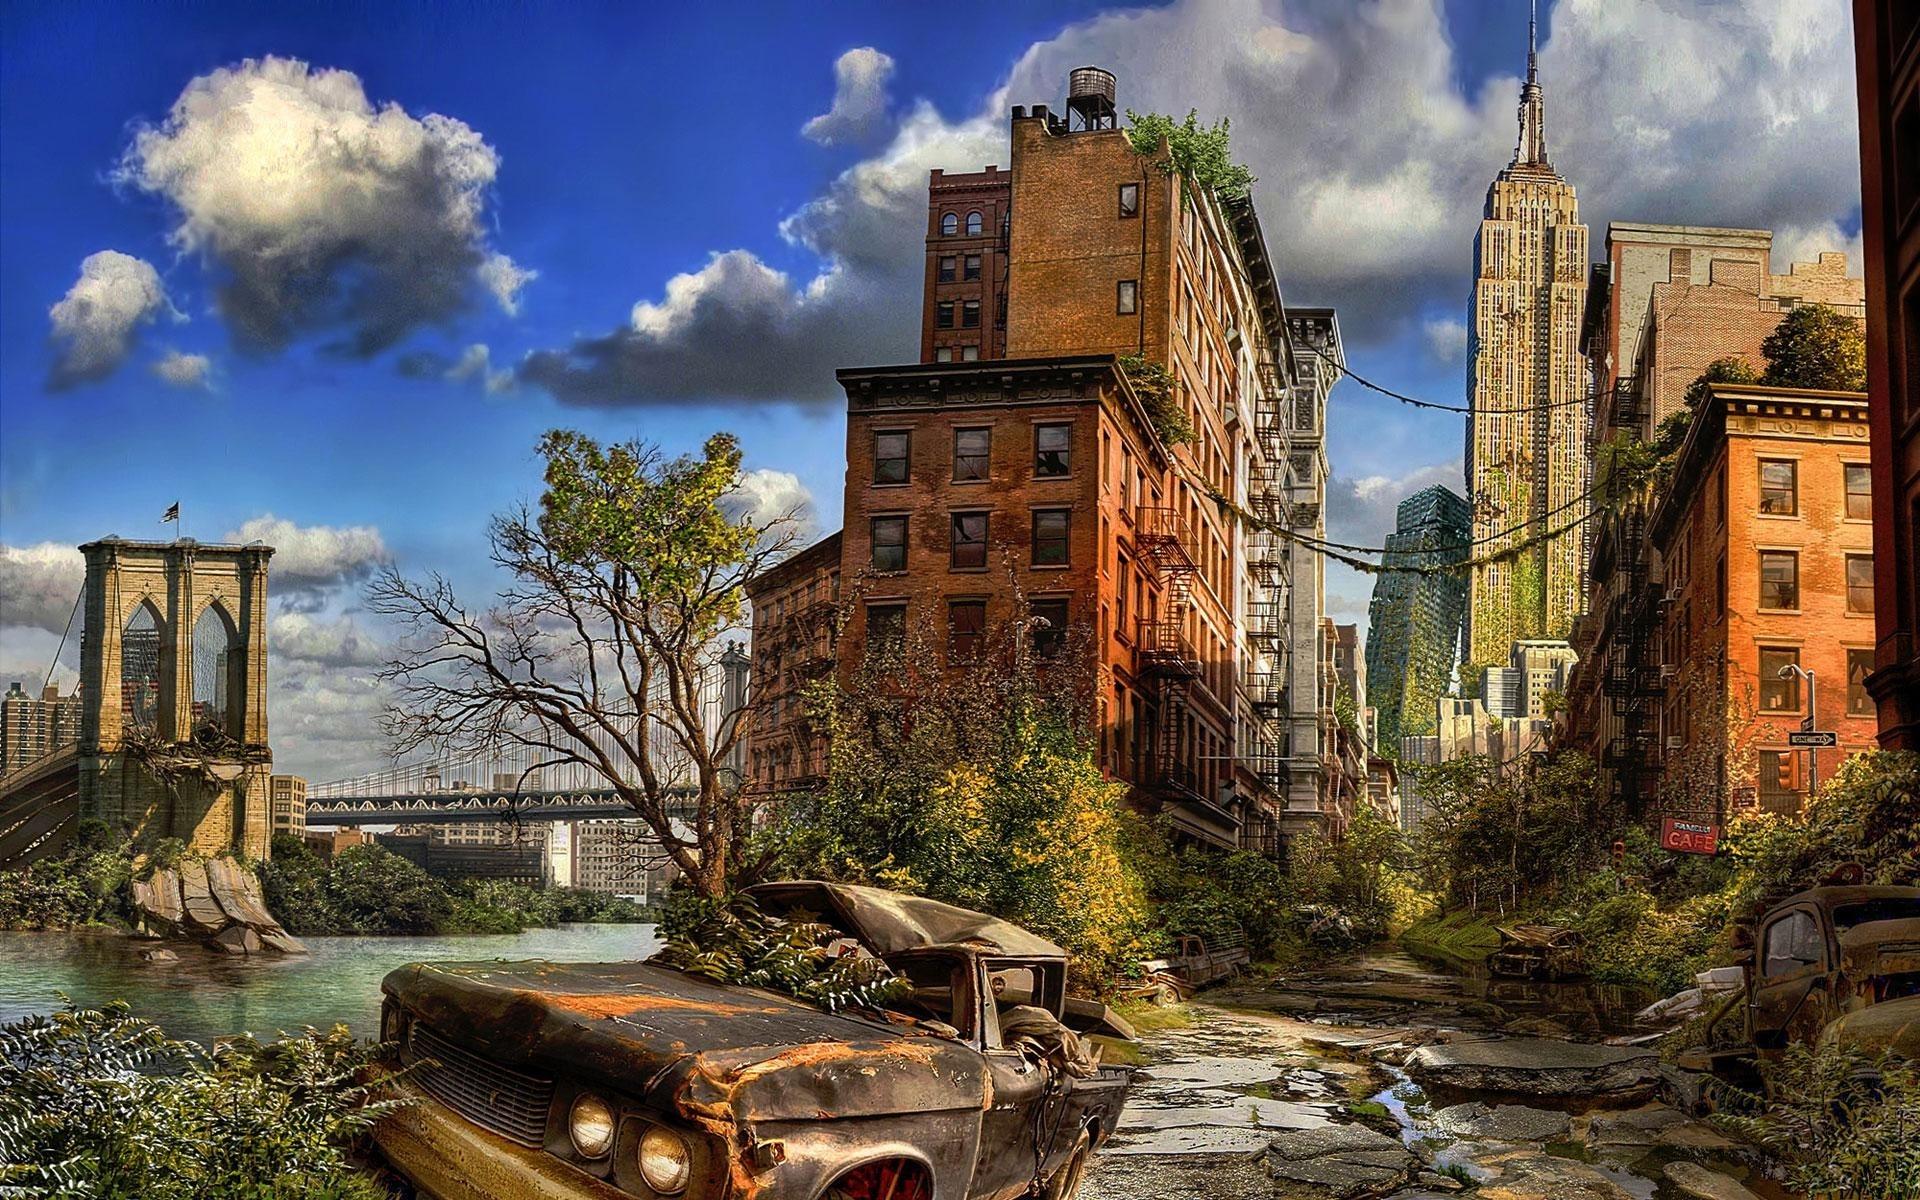 nyu-york_new_york_apokalipsis_razvaliny_ruiny_zdanie_25376_1920x1200.jpg